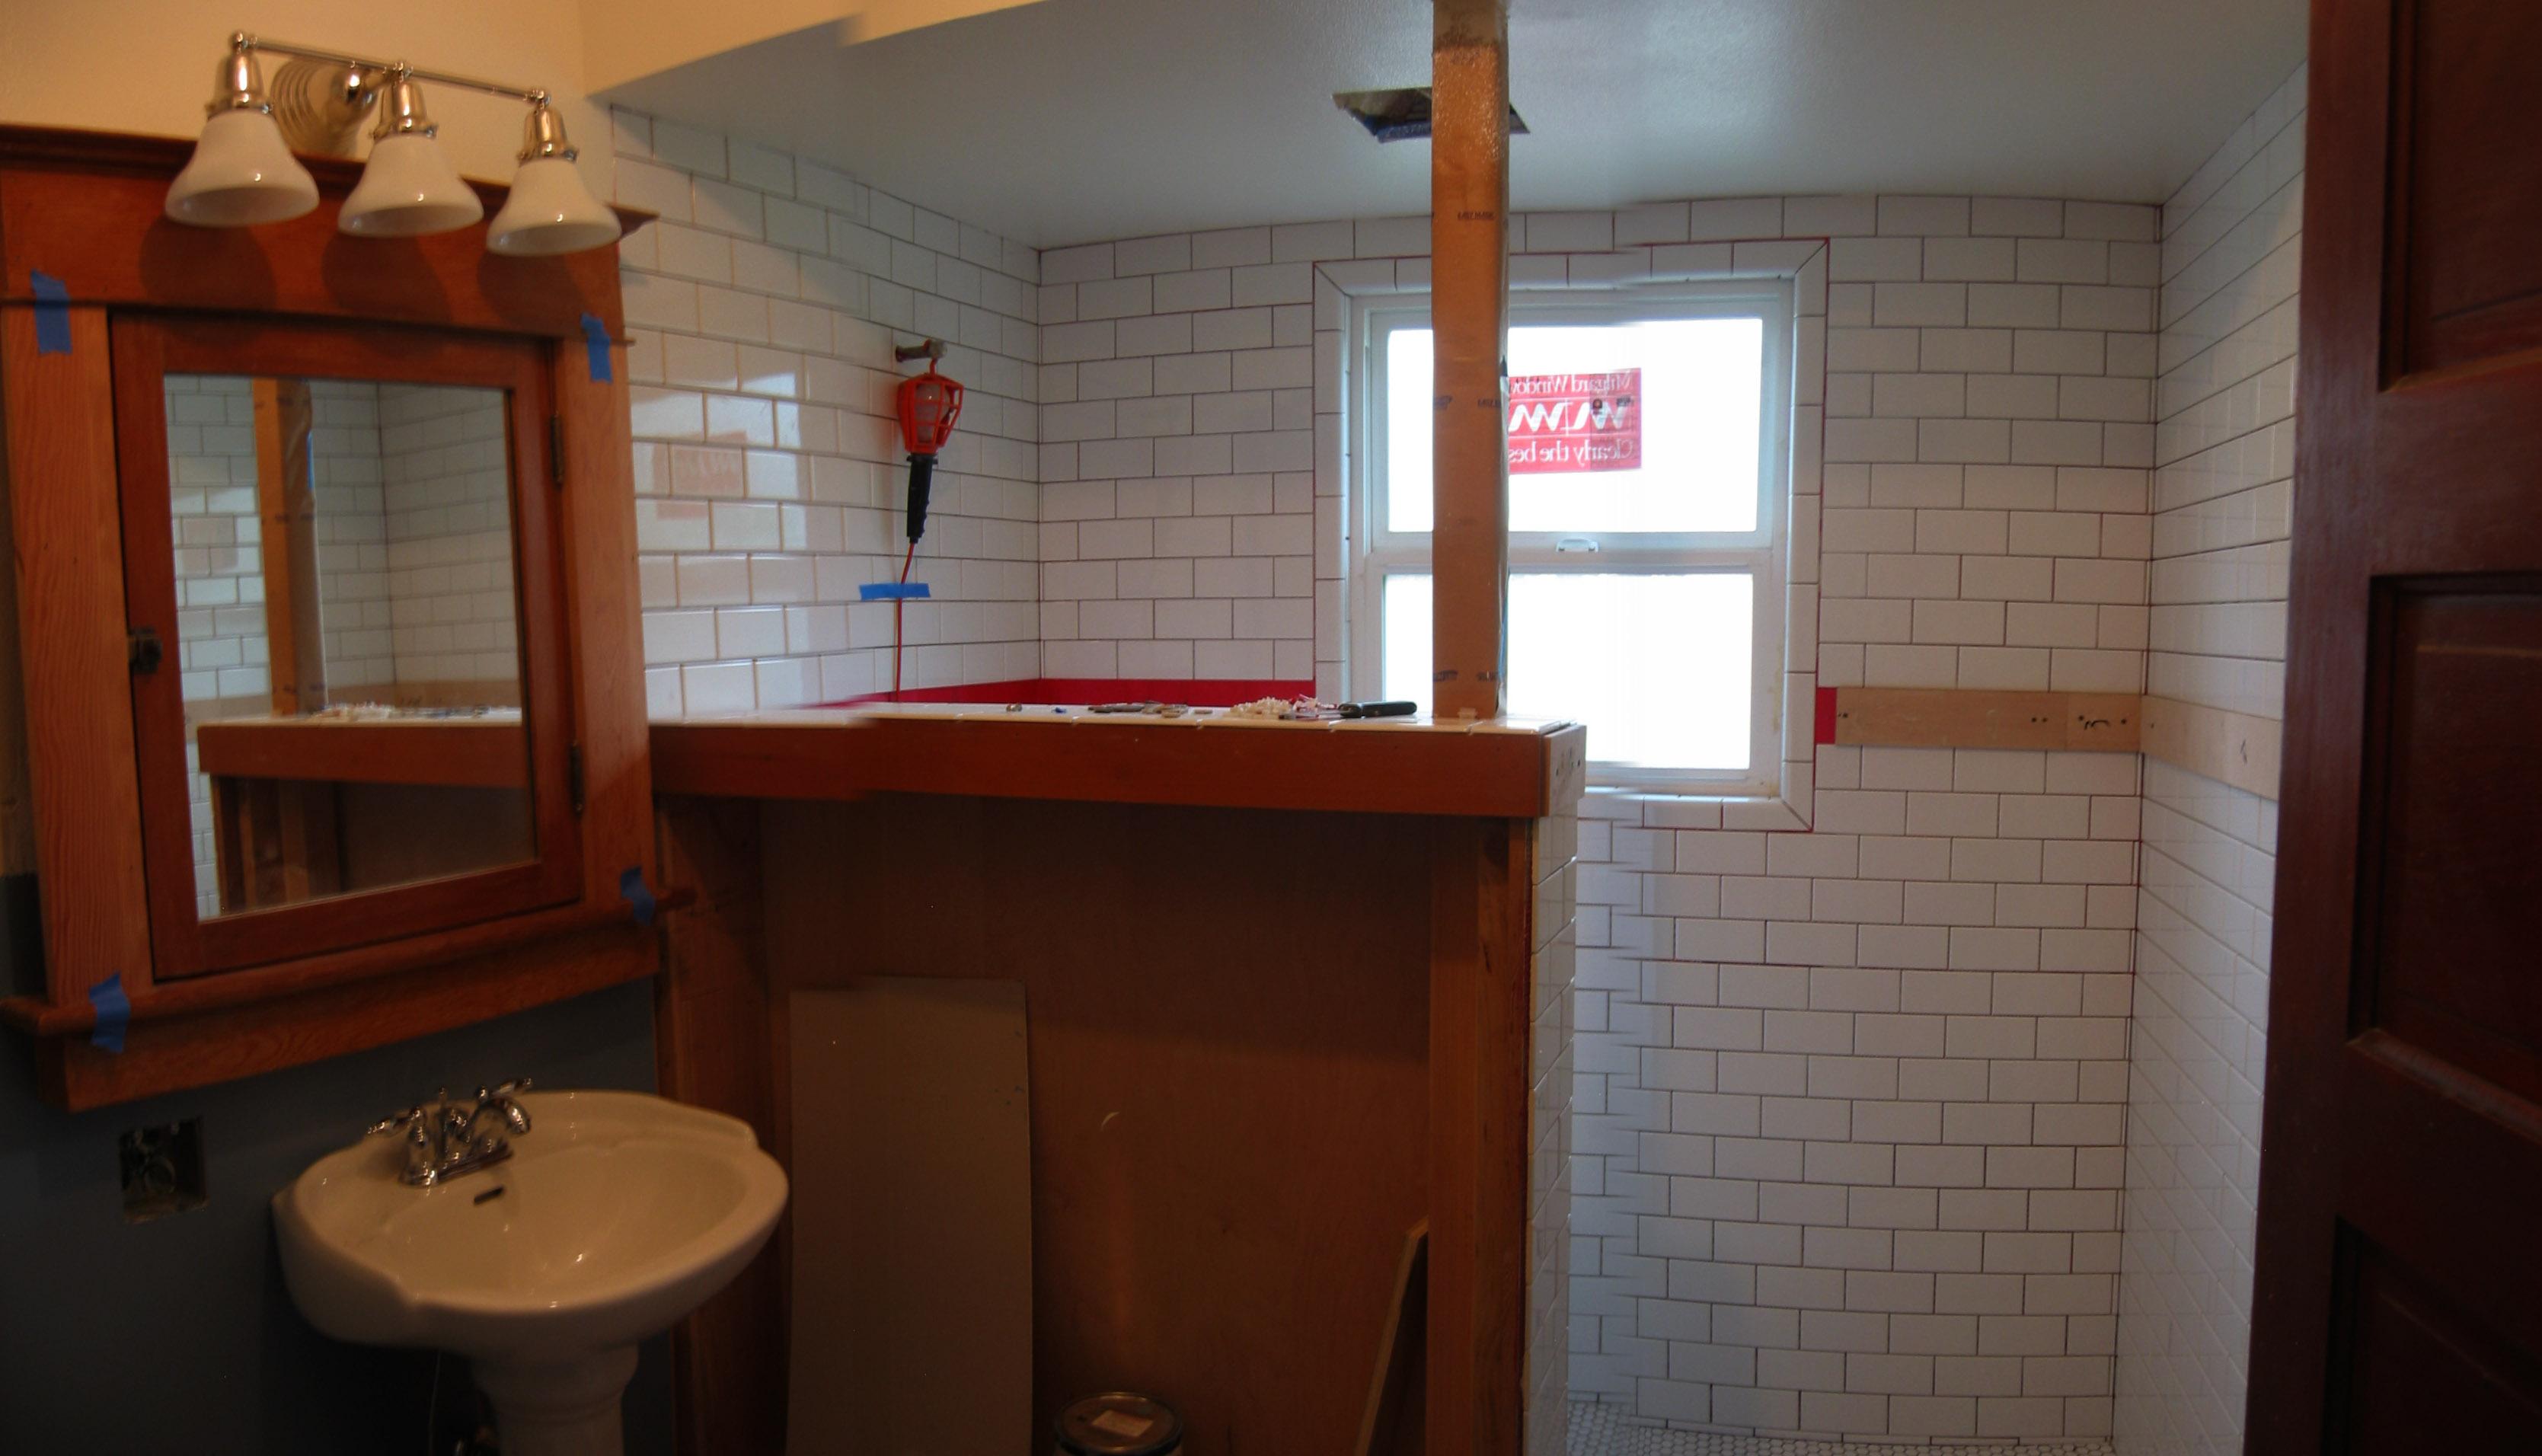 Lewis bathroom renovation construction